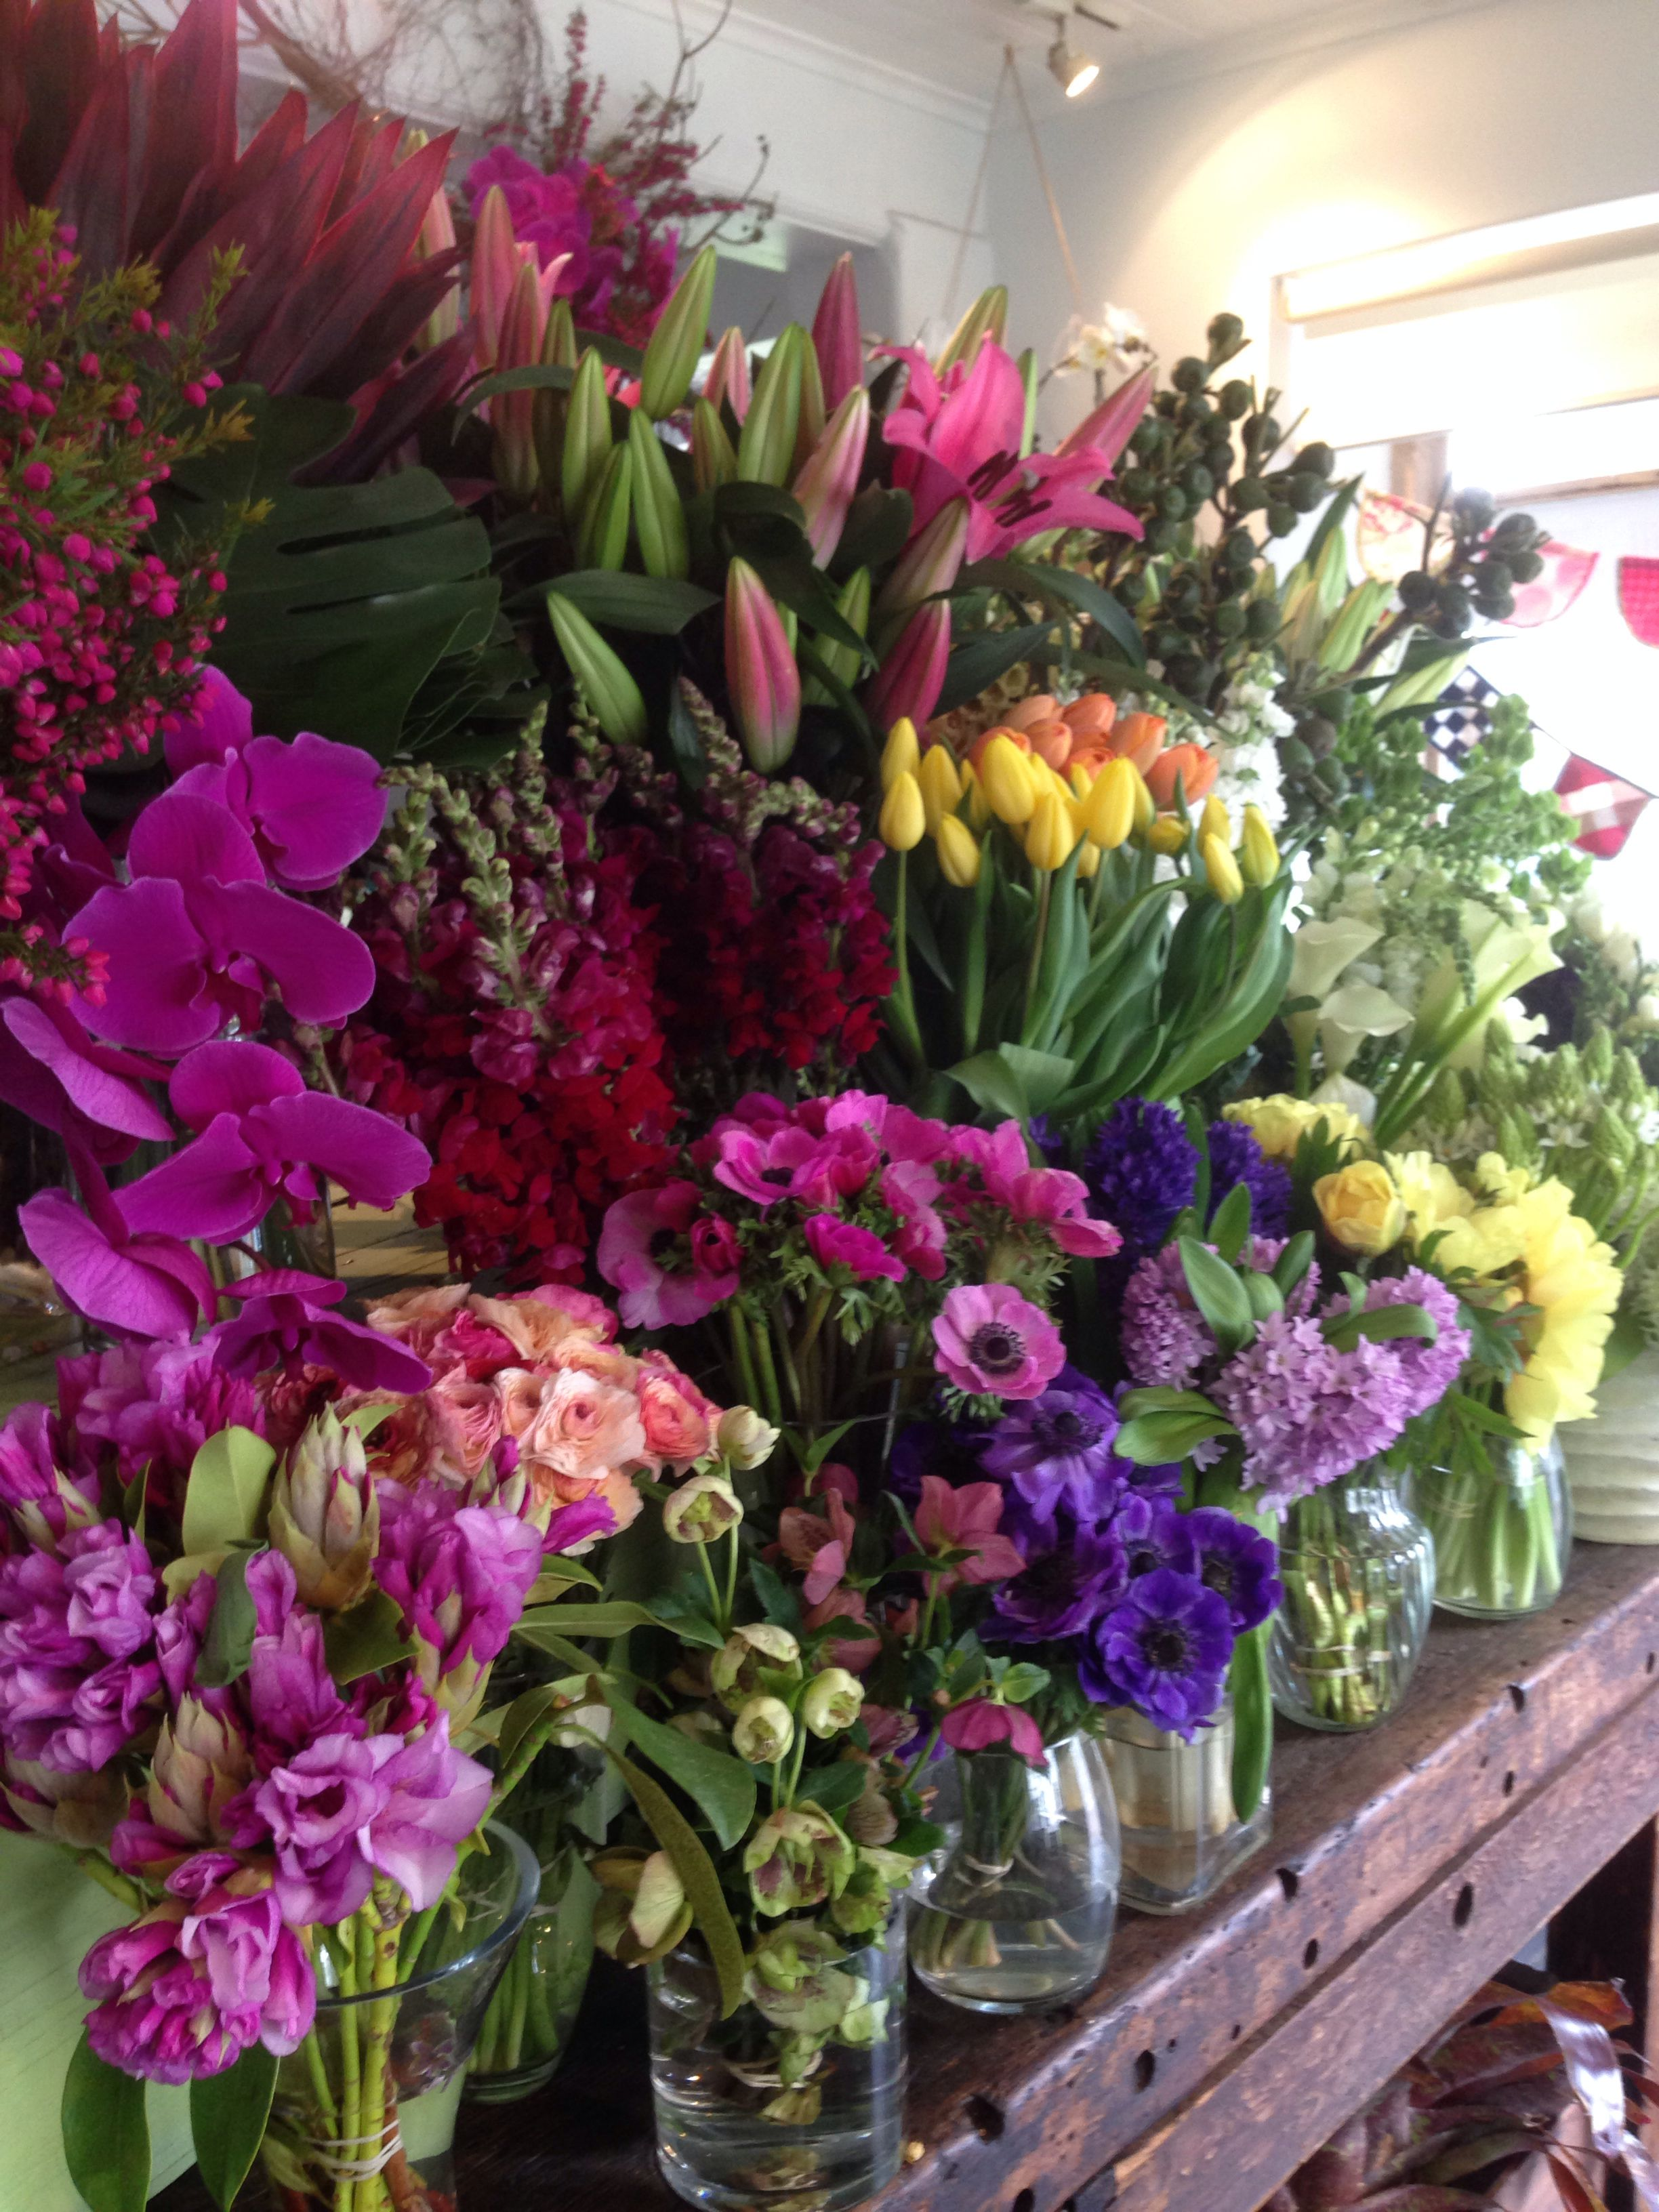 The Village Florist Rangkaian bunga Pinterest #1: 0d04c f24dccaca8db d70